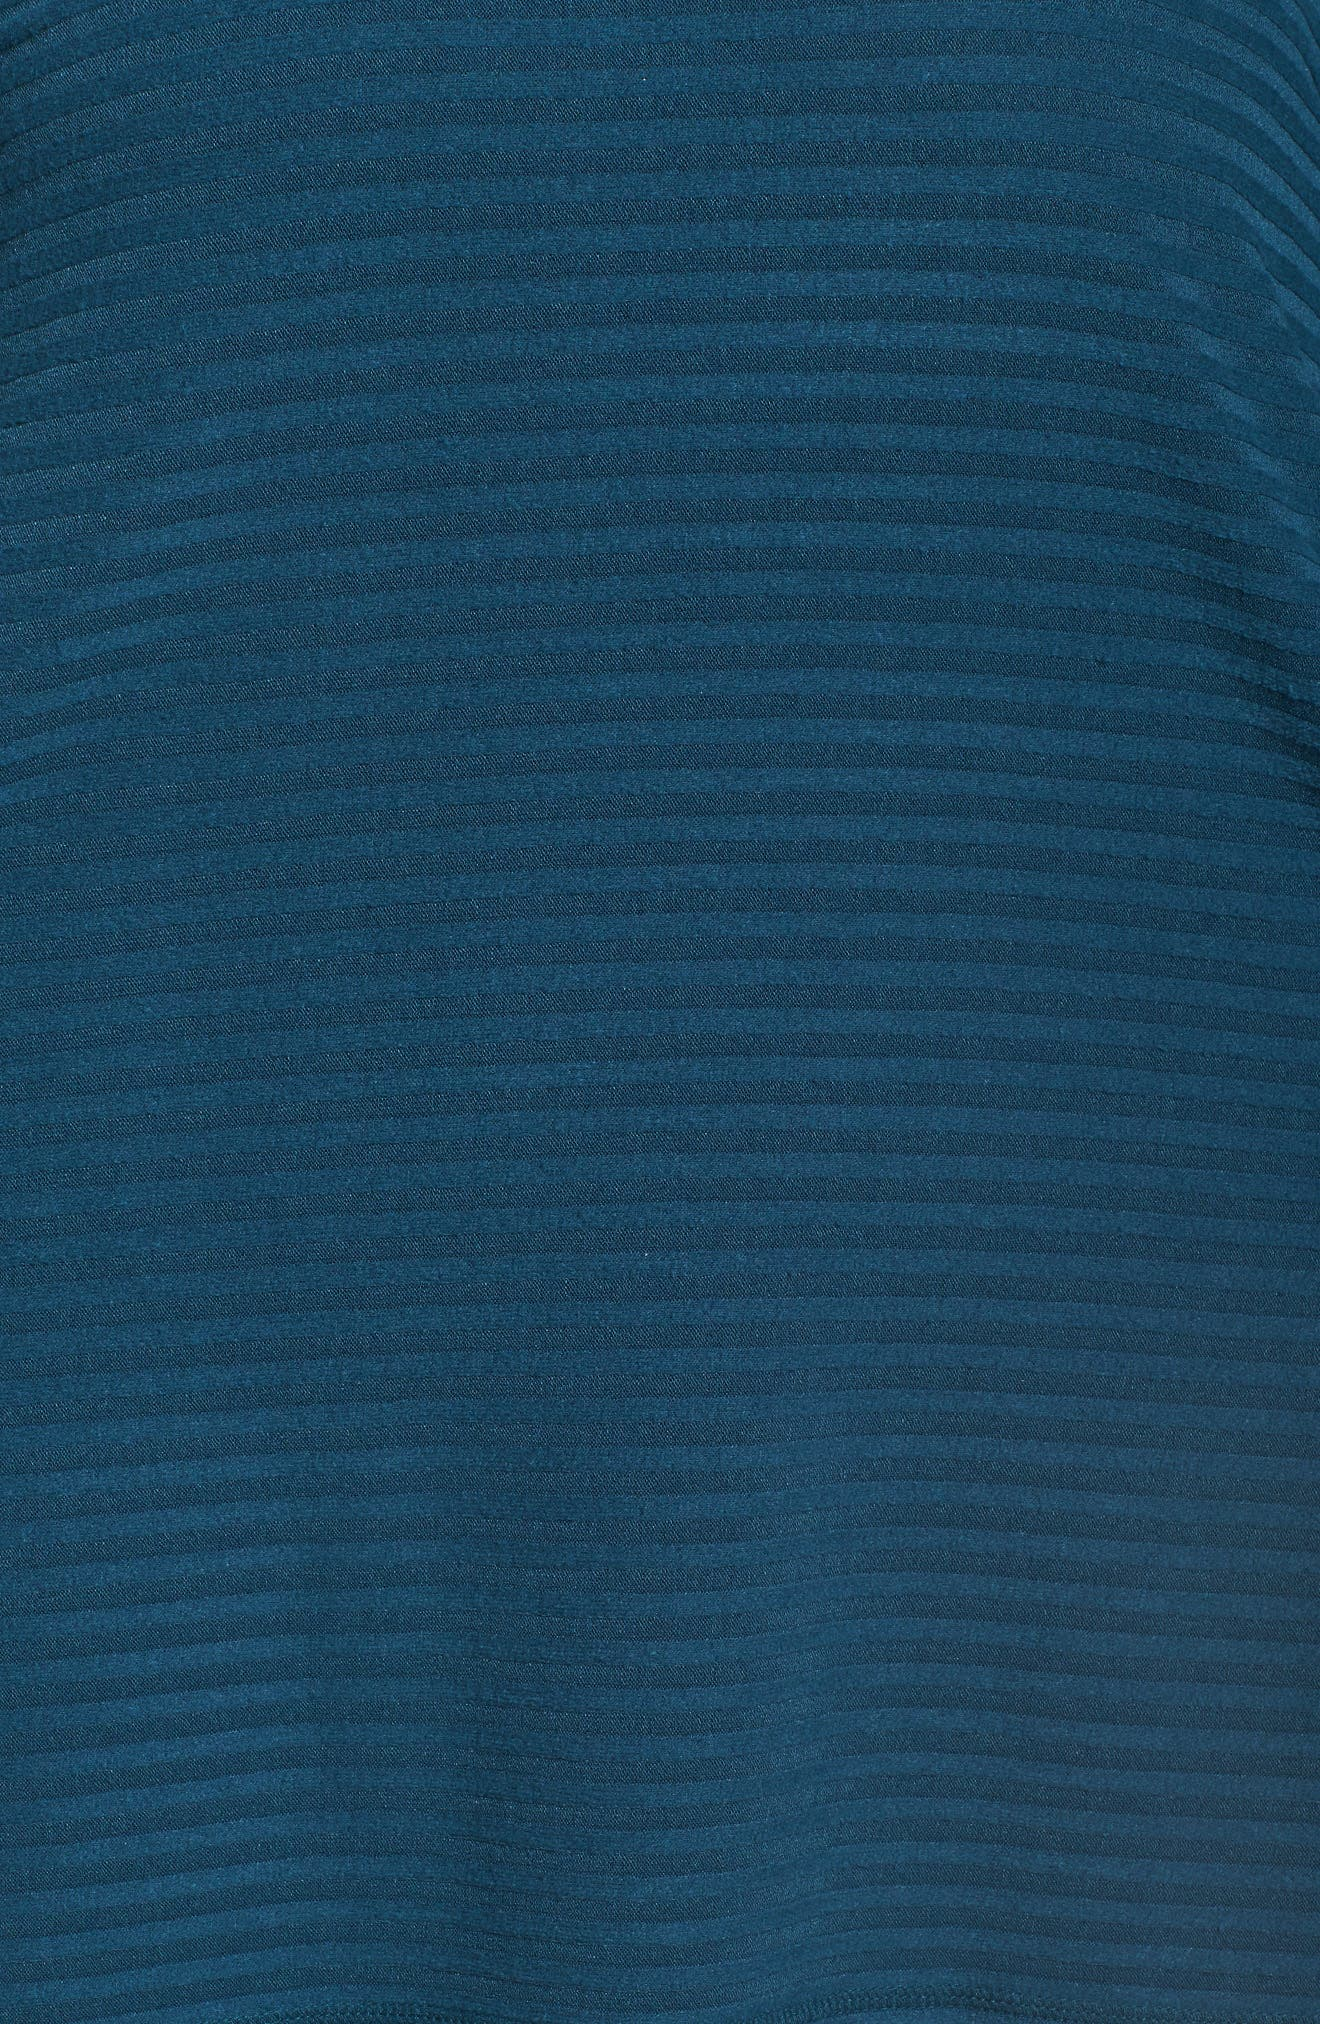 Cowl Neck Poncho Top,                             Alternate thumbnail 15, color,